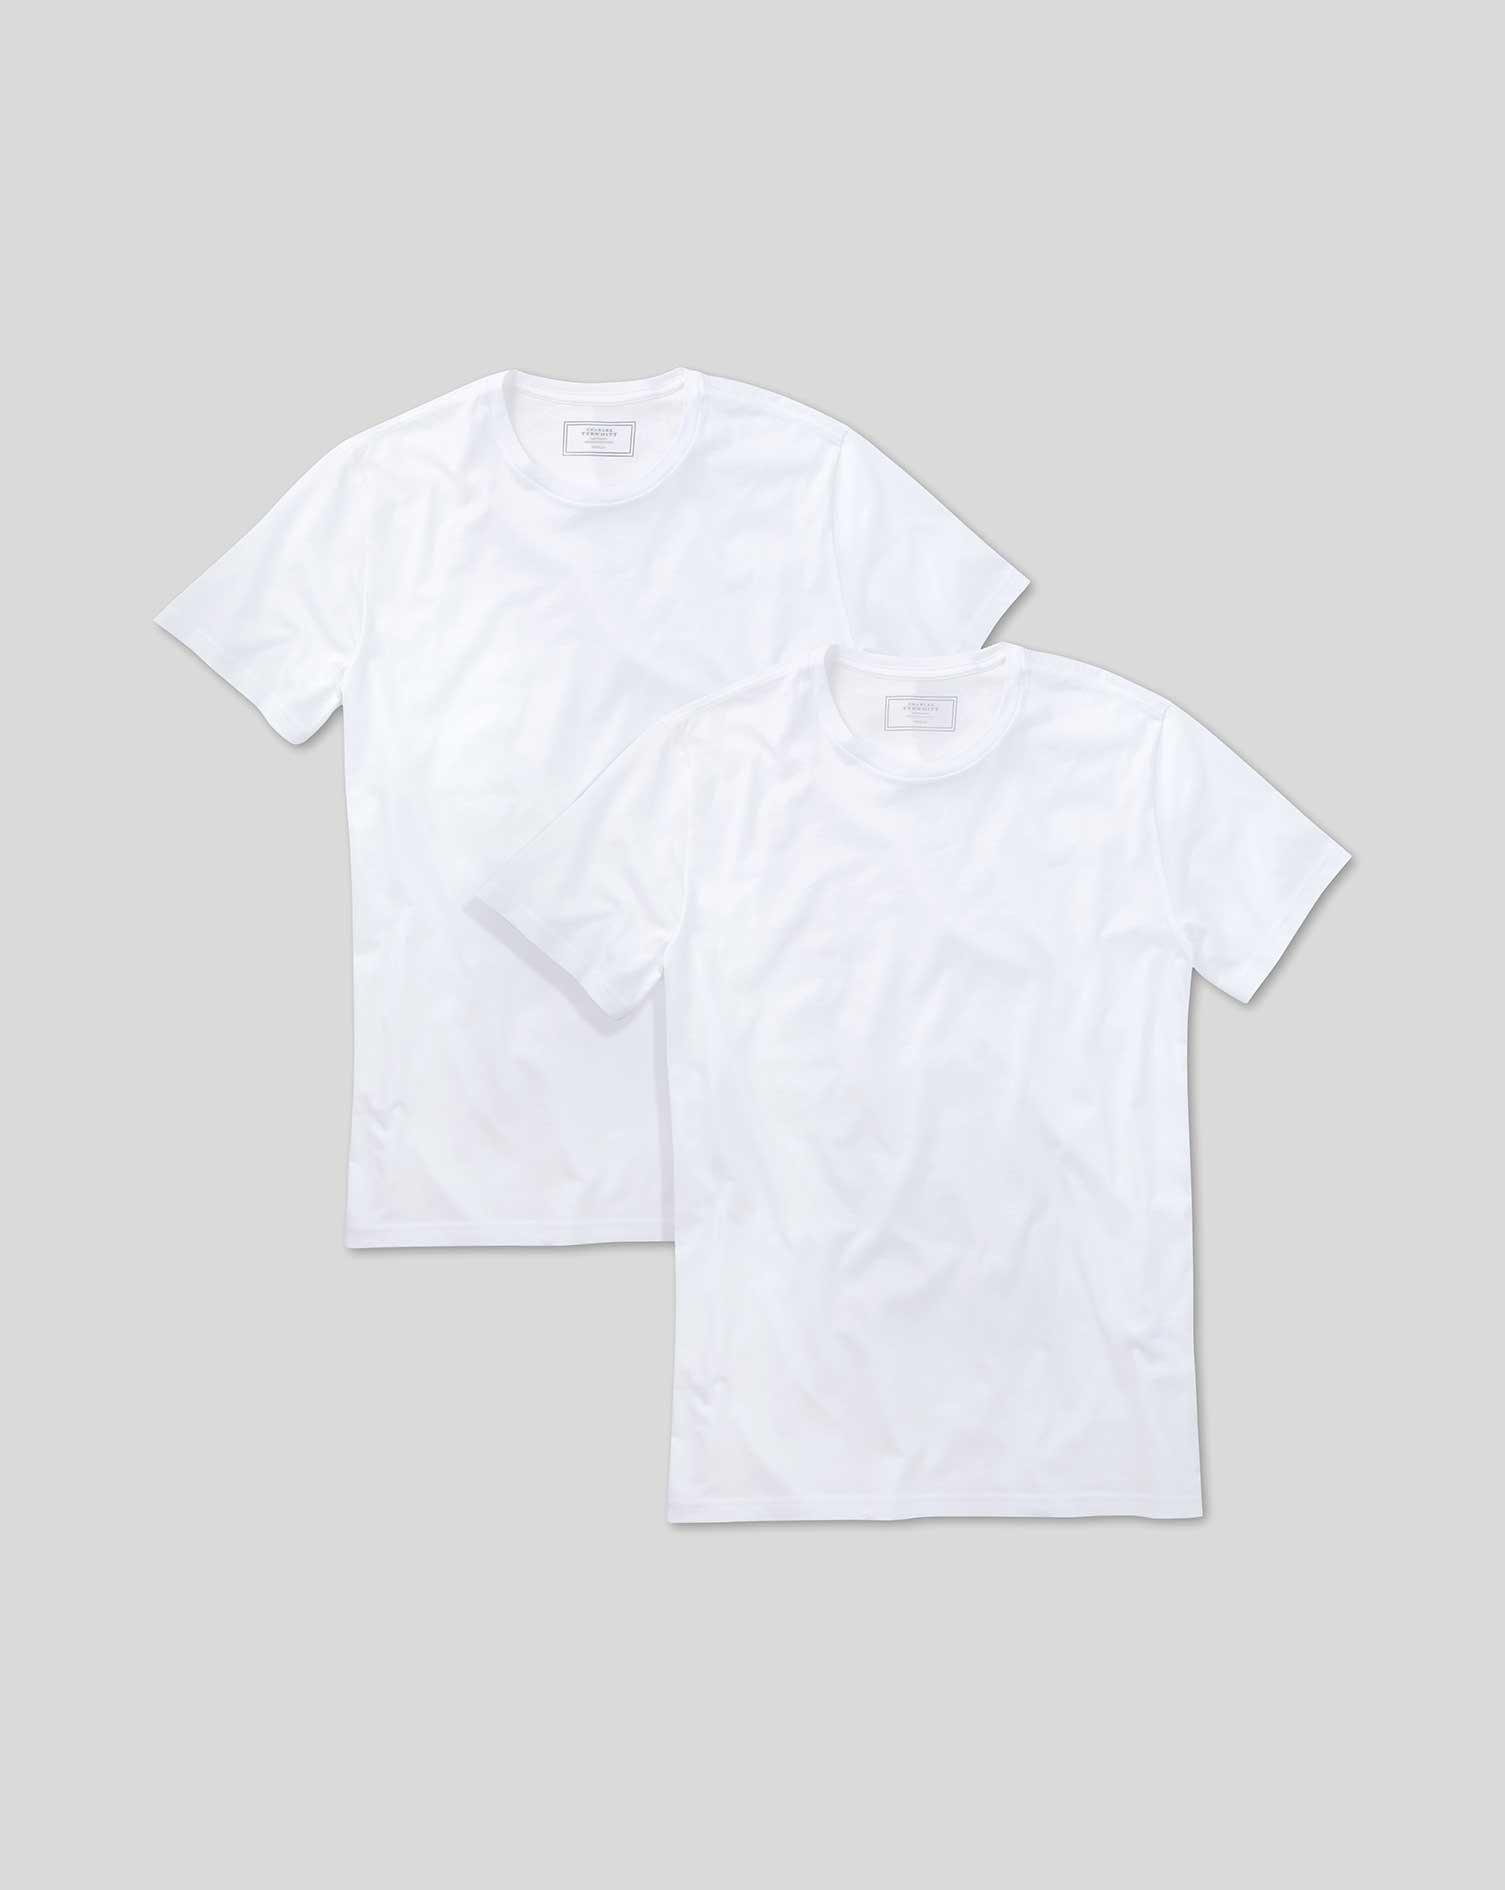 Image of Charles Tyrwhitt 2 Pack Crew Neck Undershirt T-Shirt - White Size Large by Charles Tyrwhitt